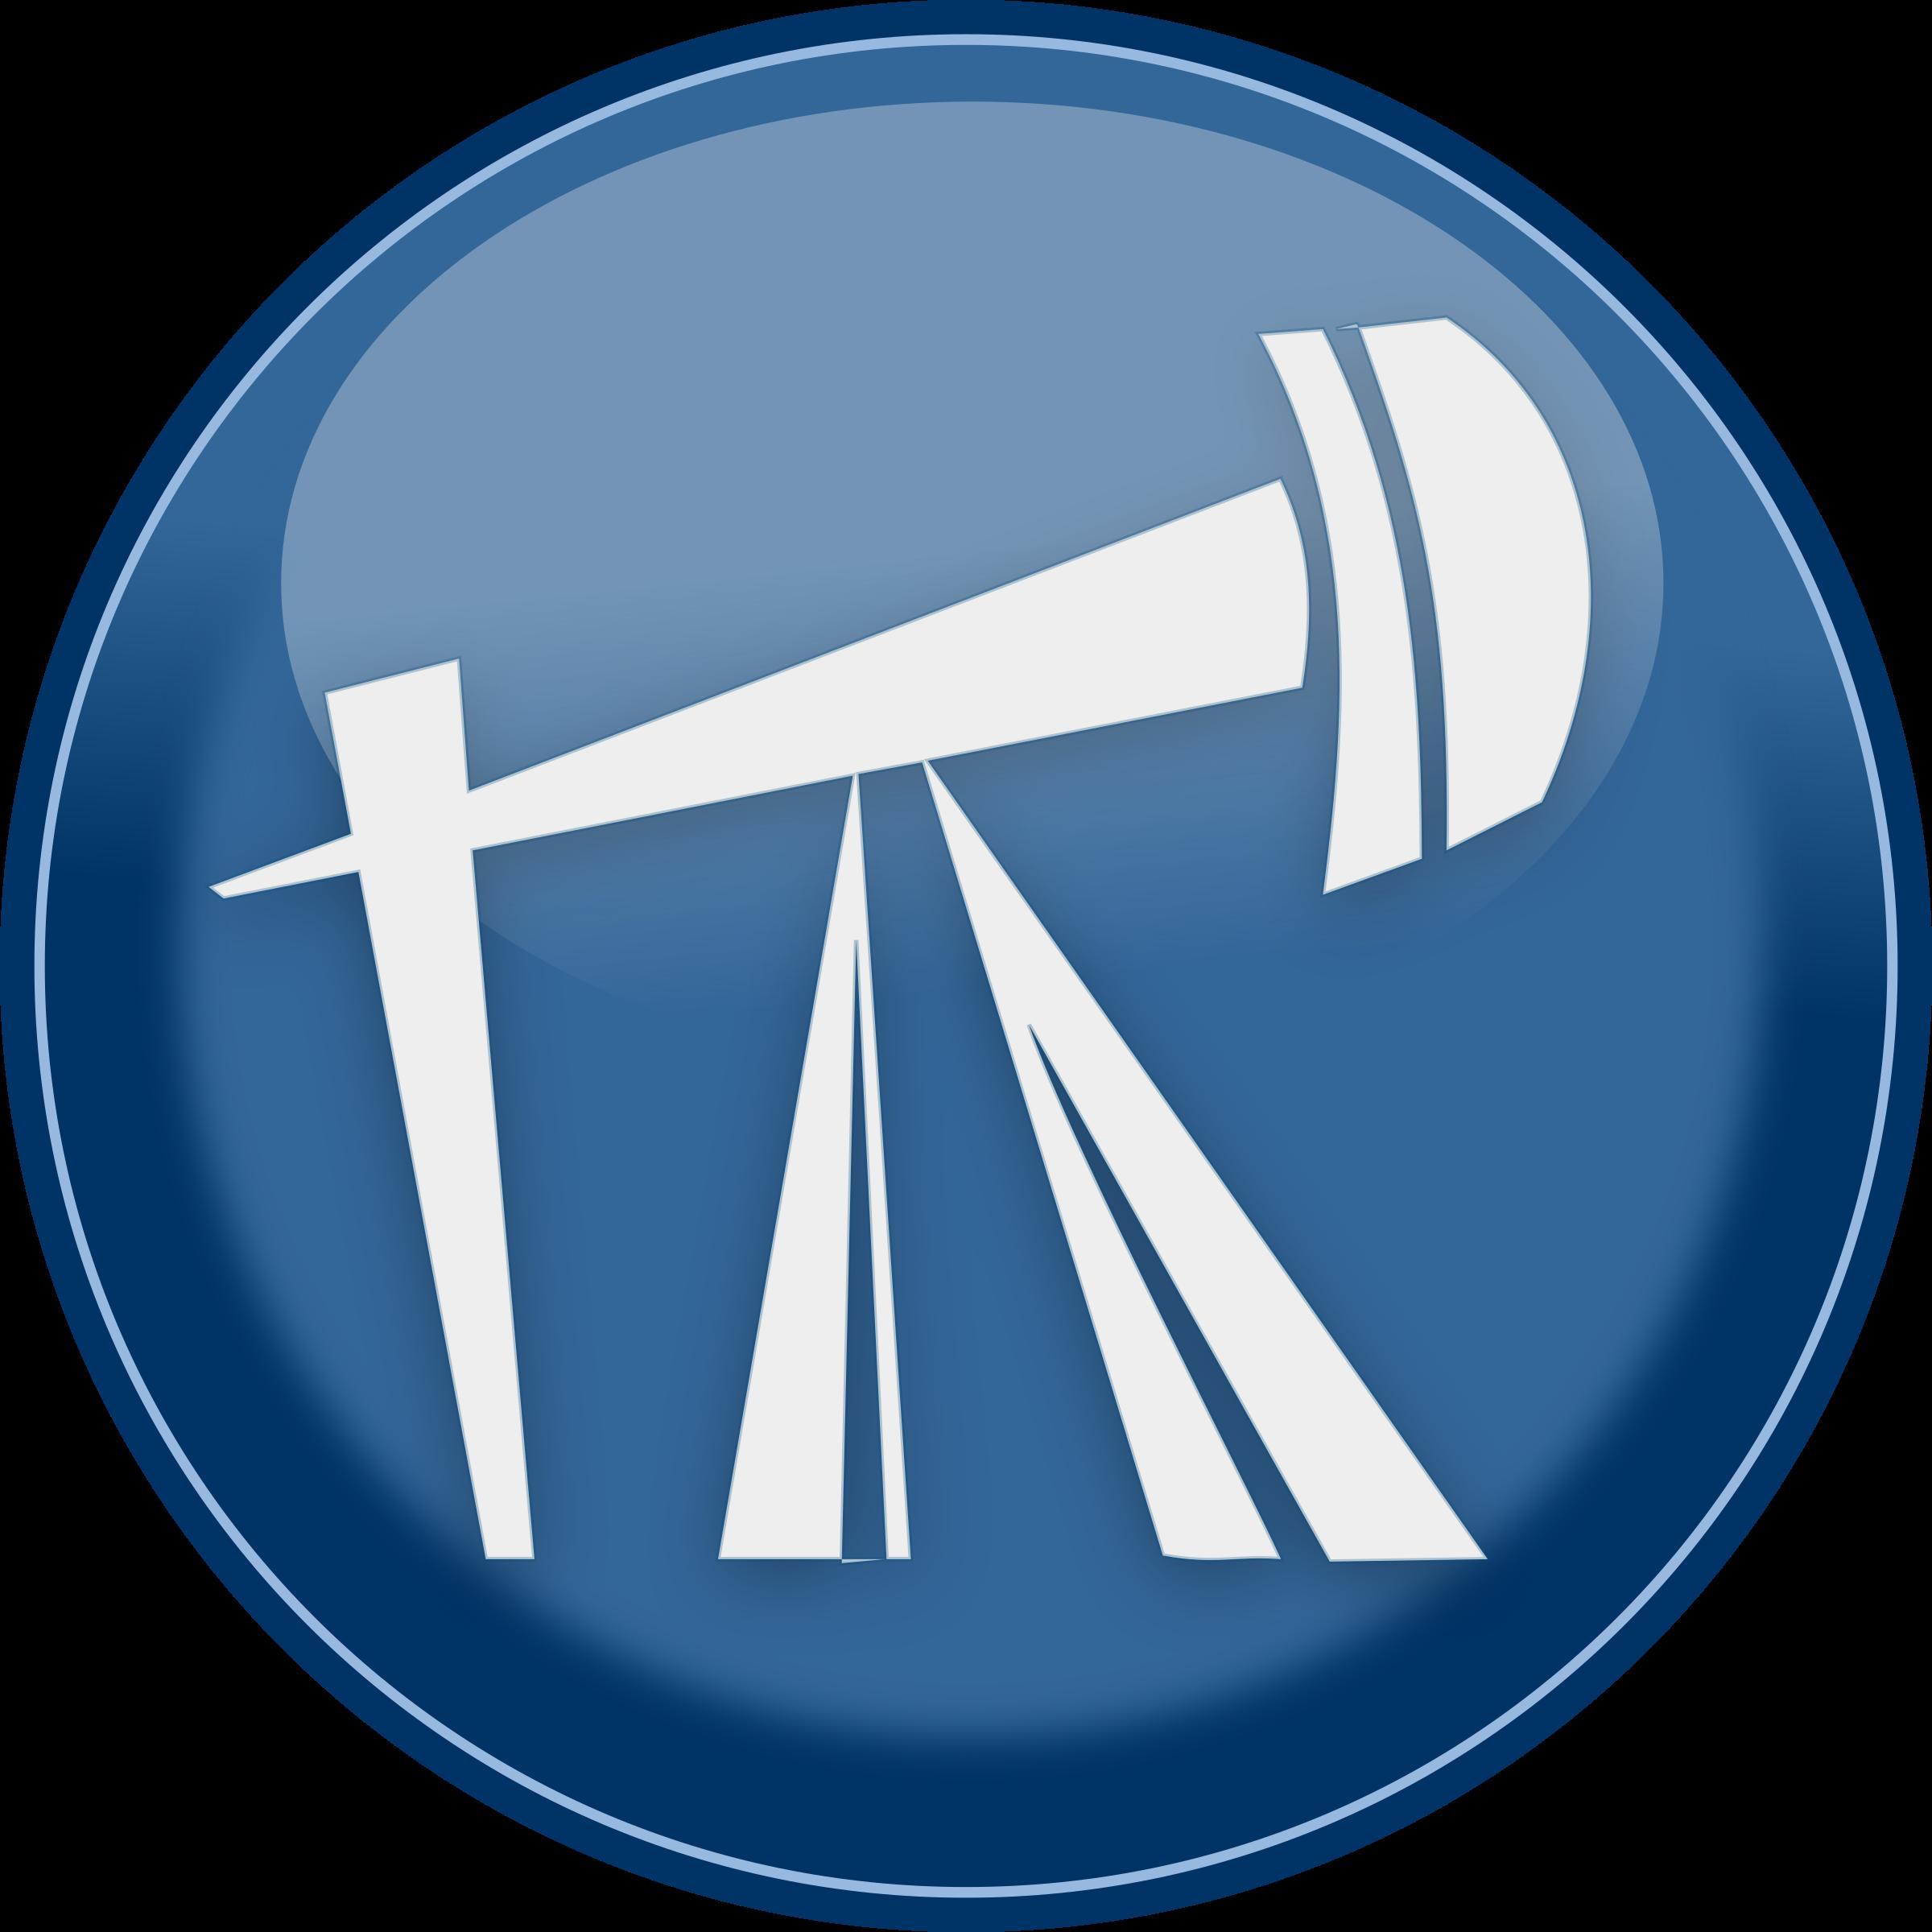 Oil clipart icon. Petroleum big image png